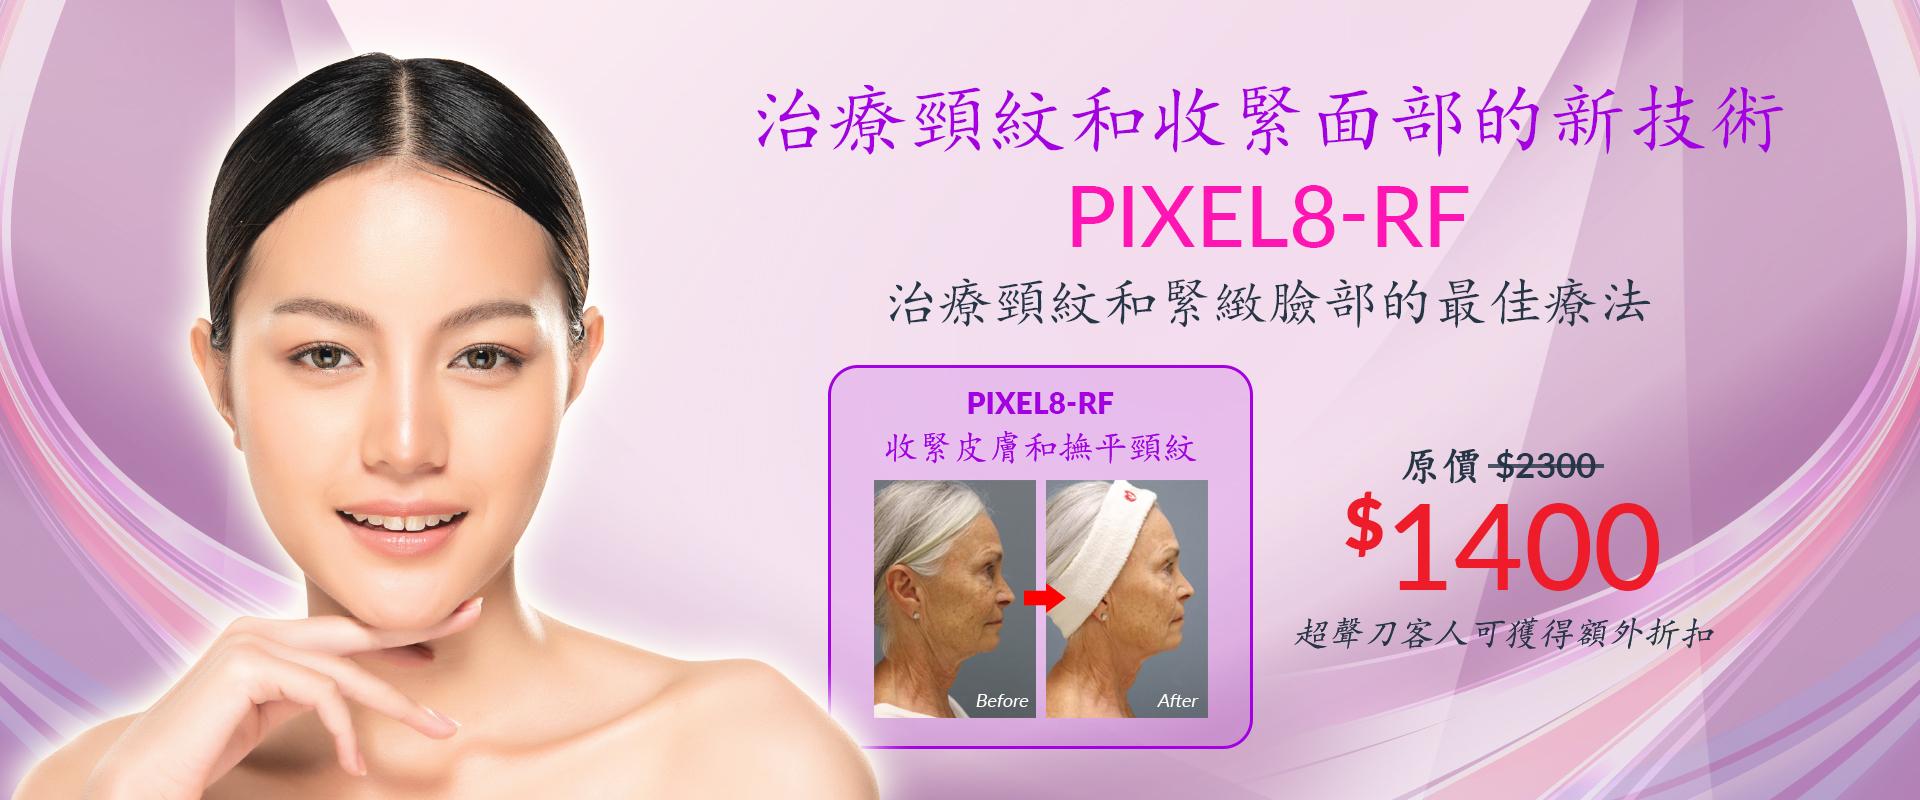 pixel-8-ch